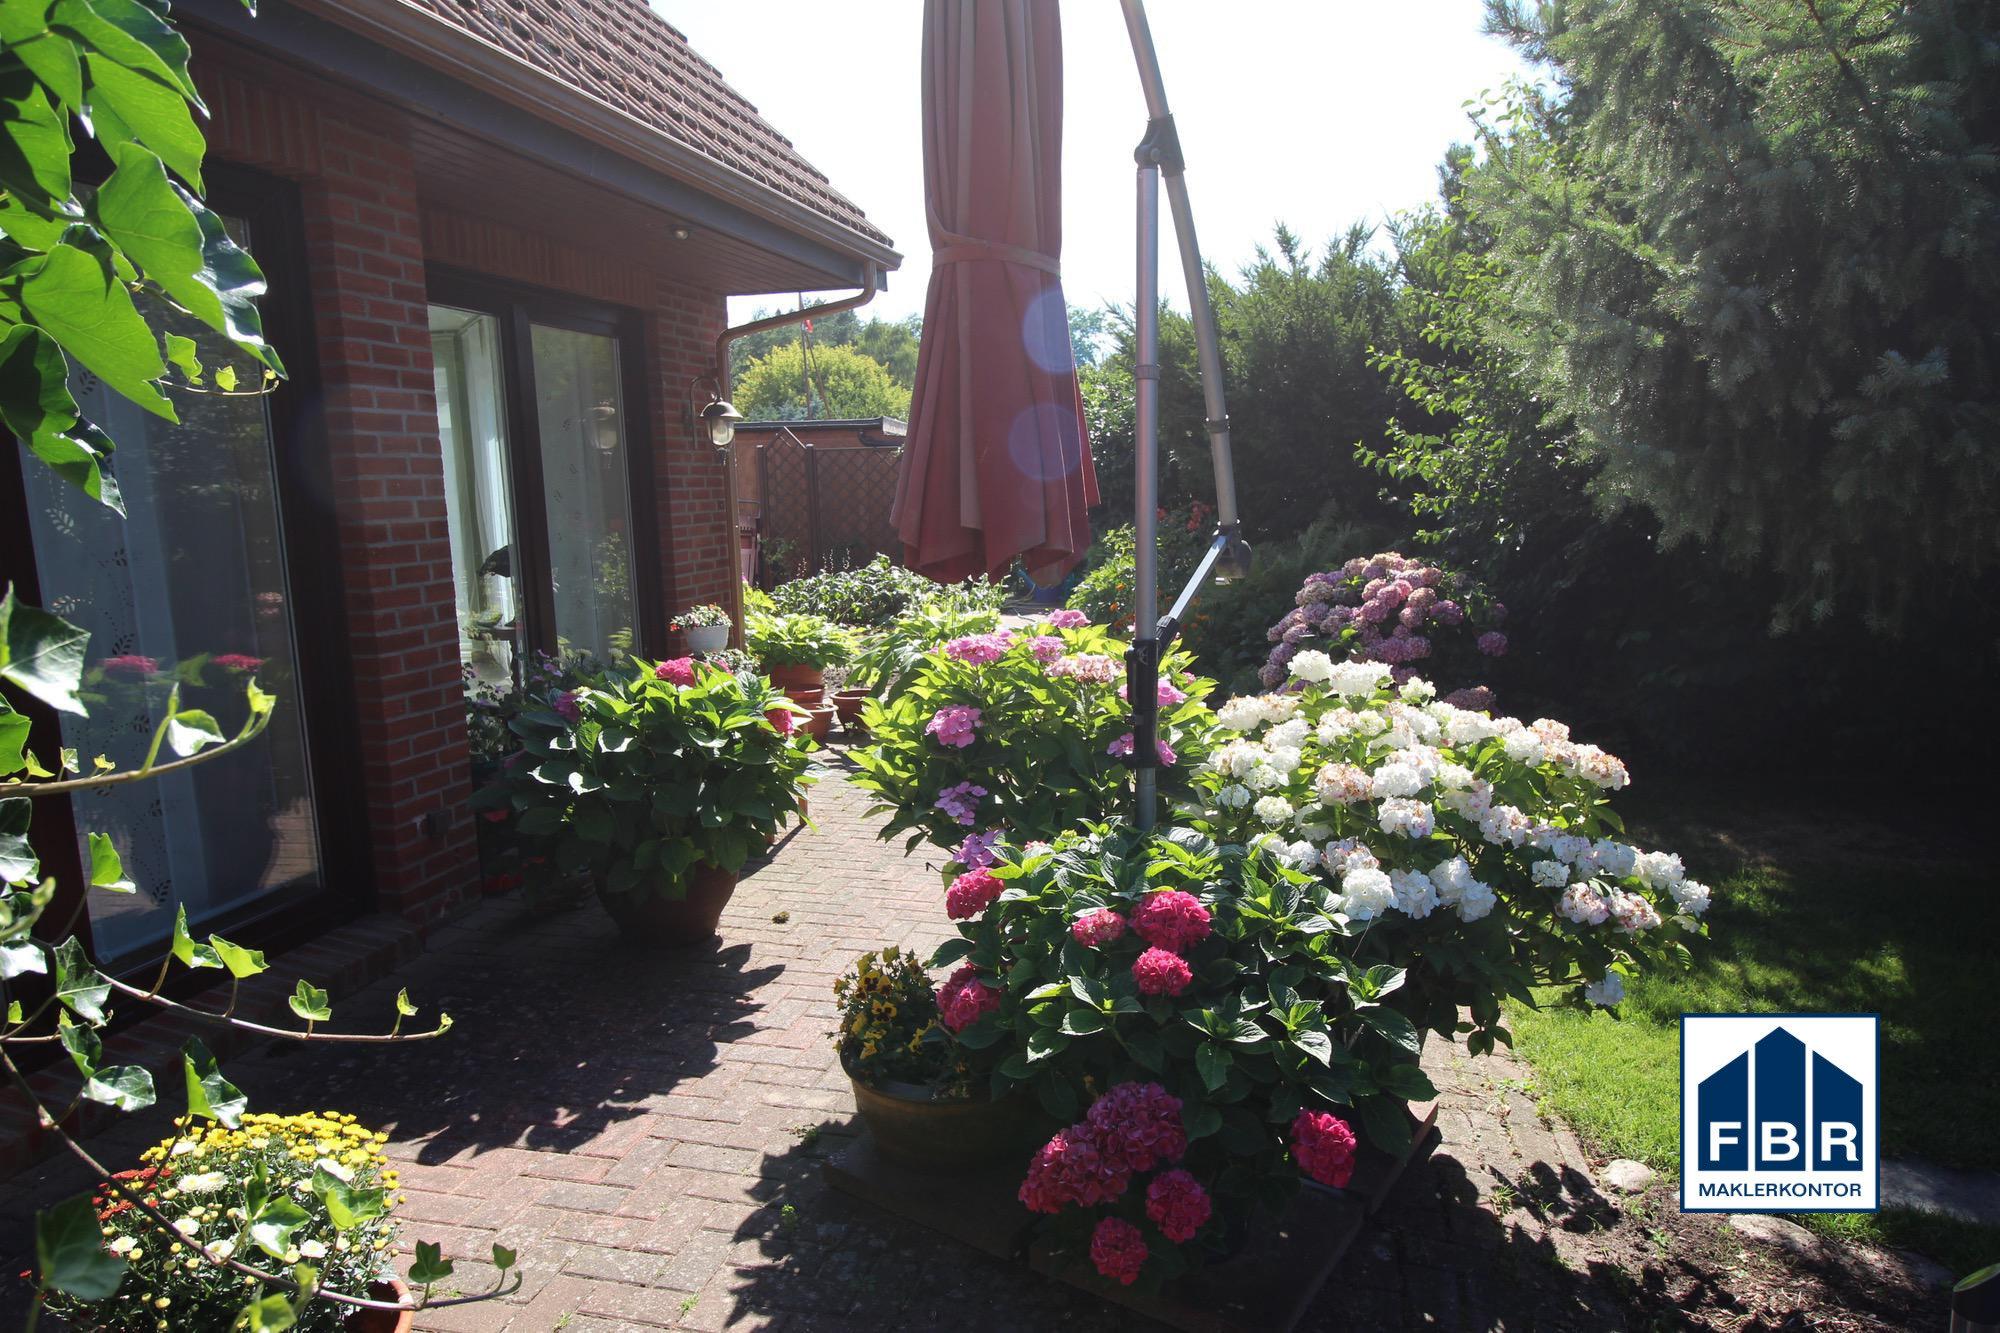 Terrassenblumen